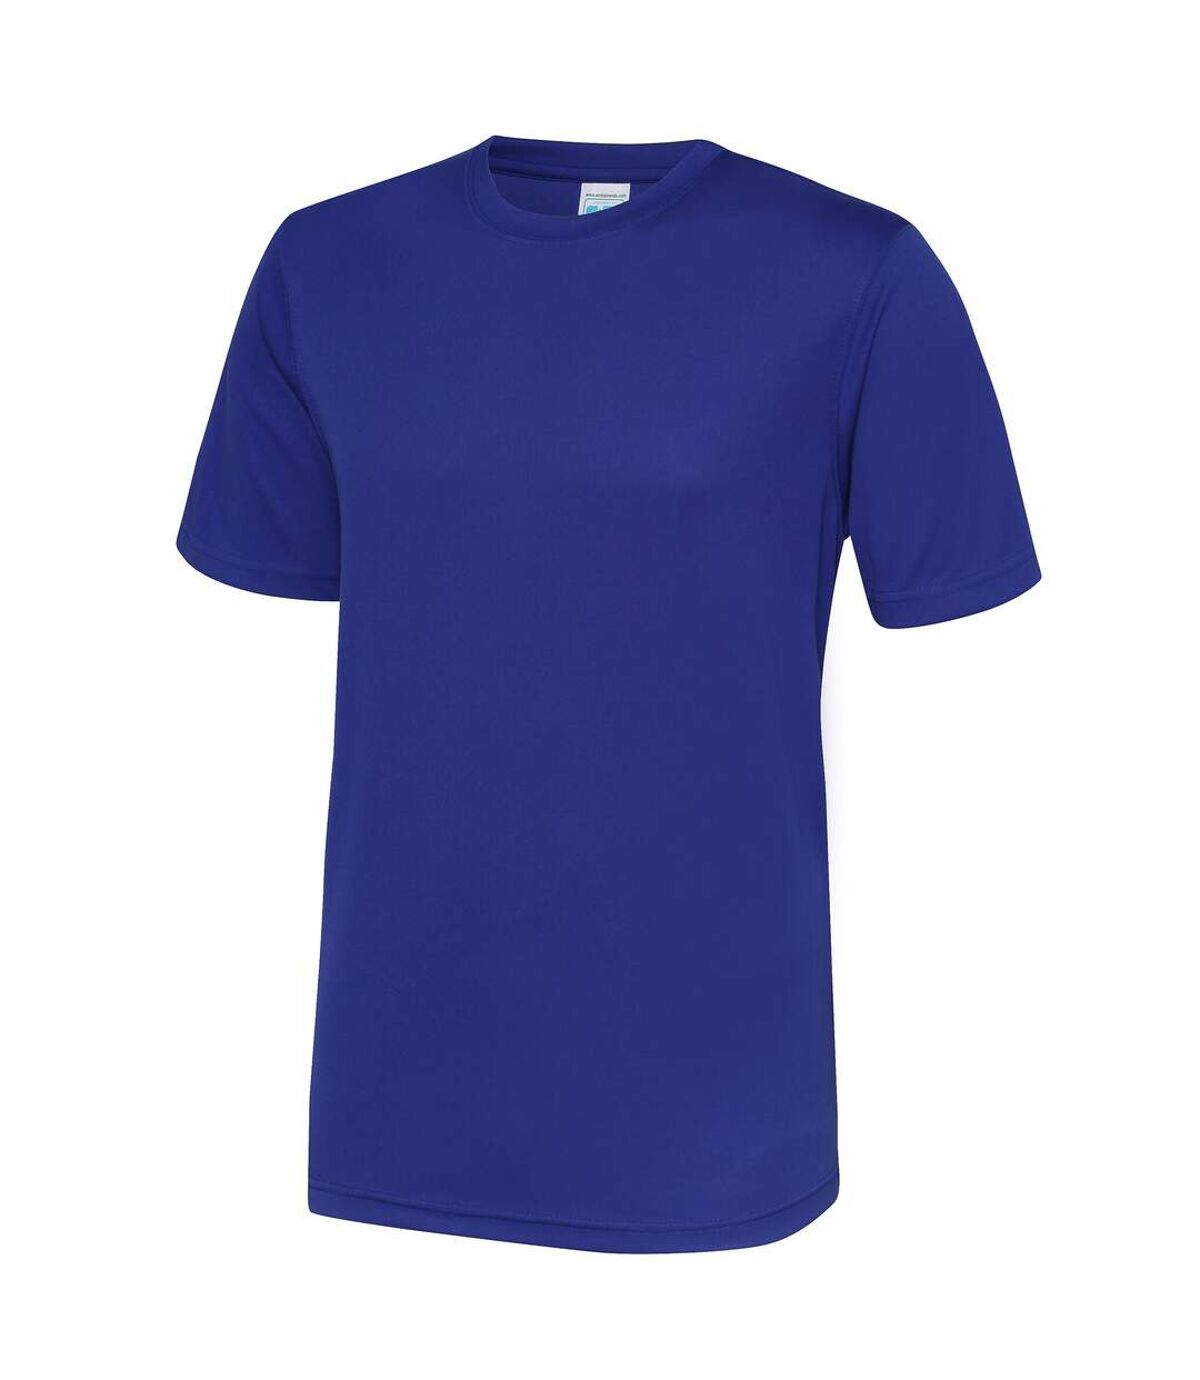 AWDis Just Cool Mens Performance Plain T-Shirt (Royal Blue) - UTRW683